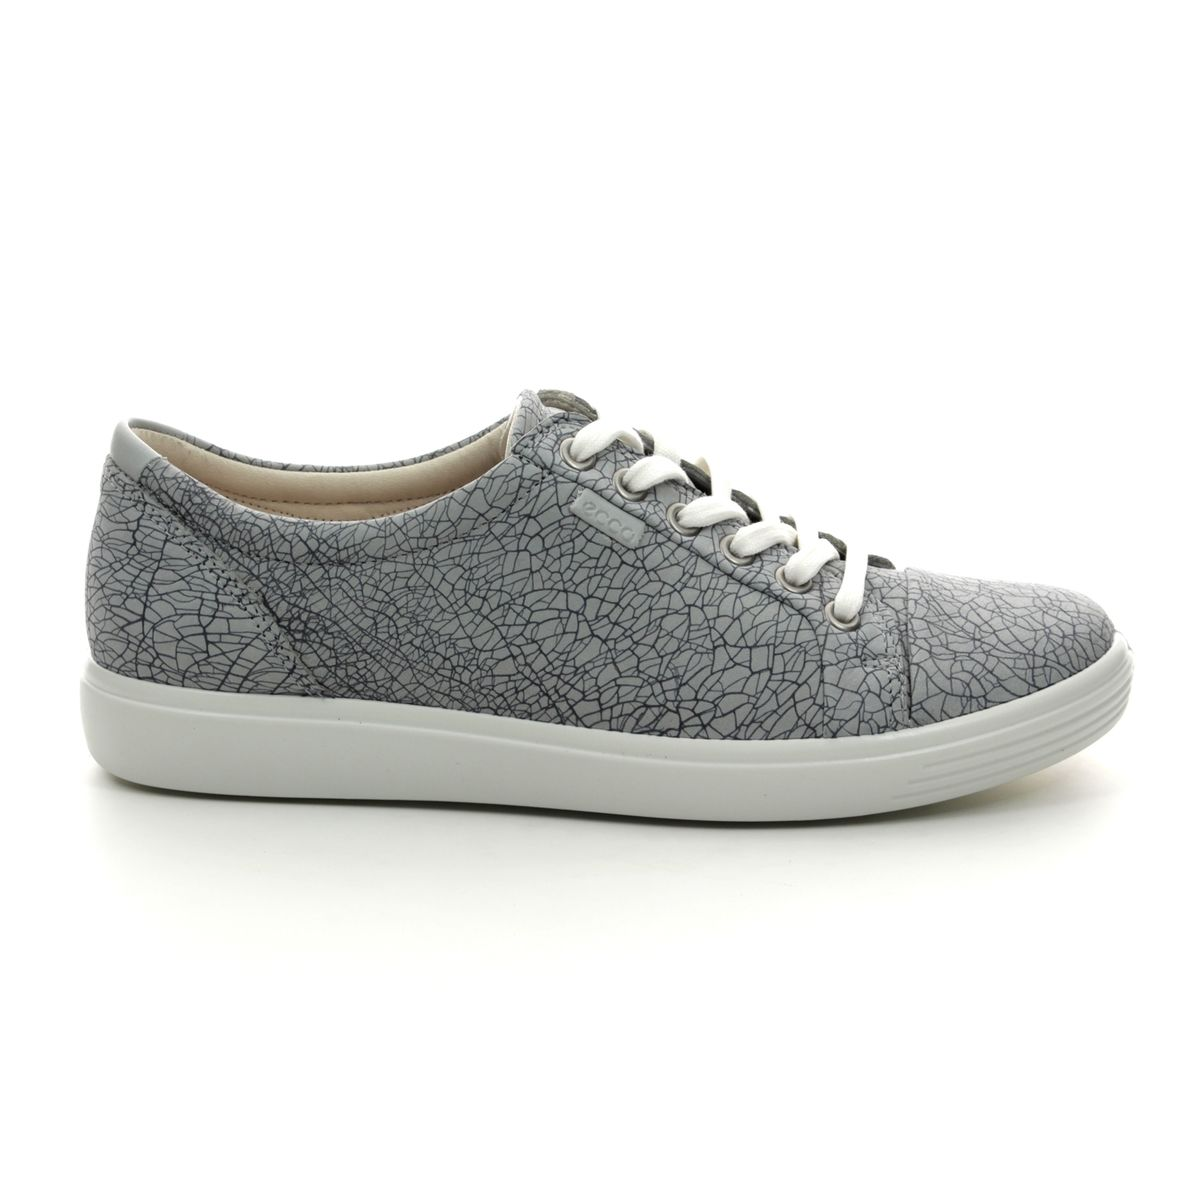 ECCO Soft 7 Lace 430003-51411 Grey